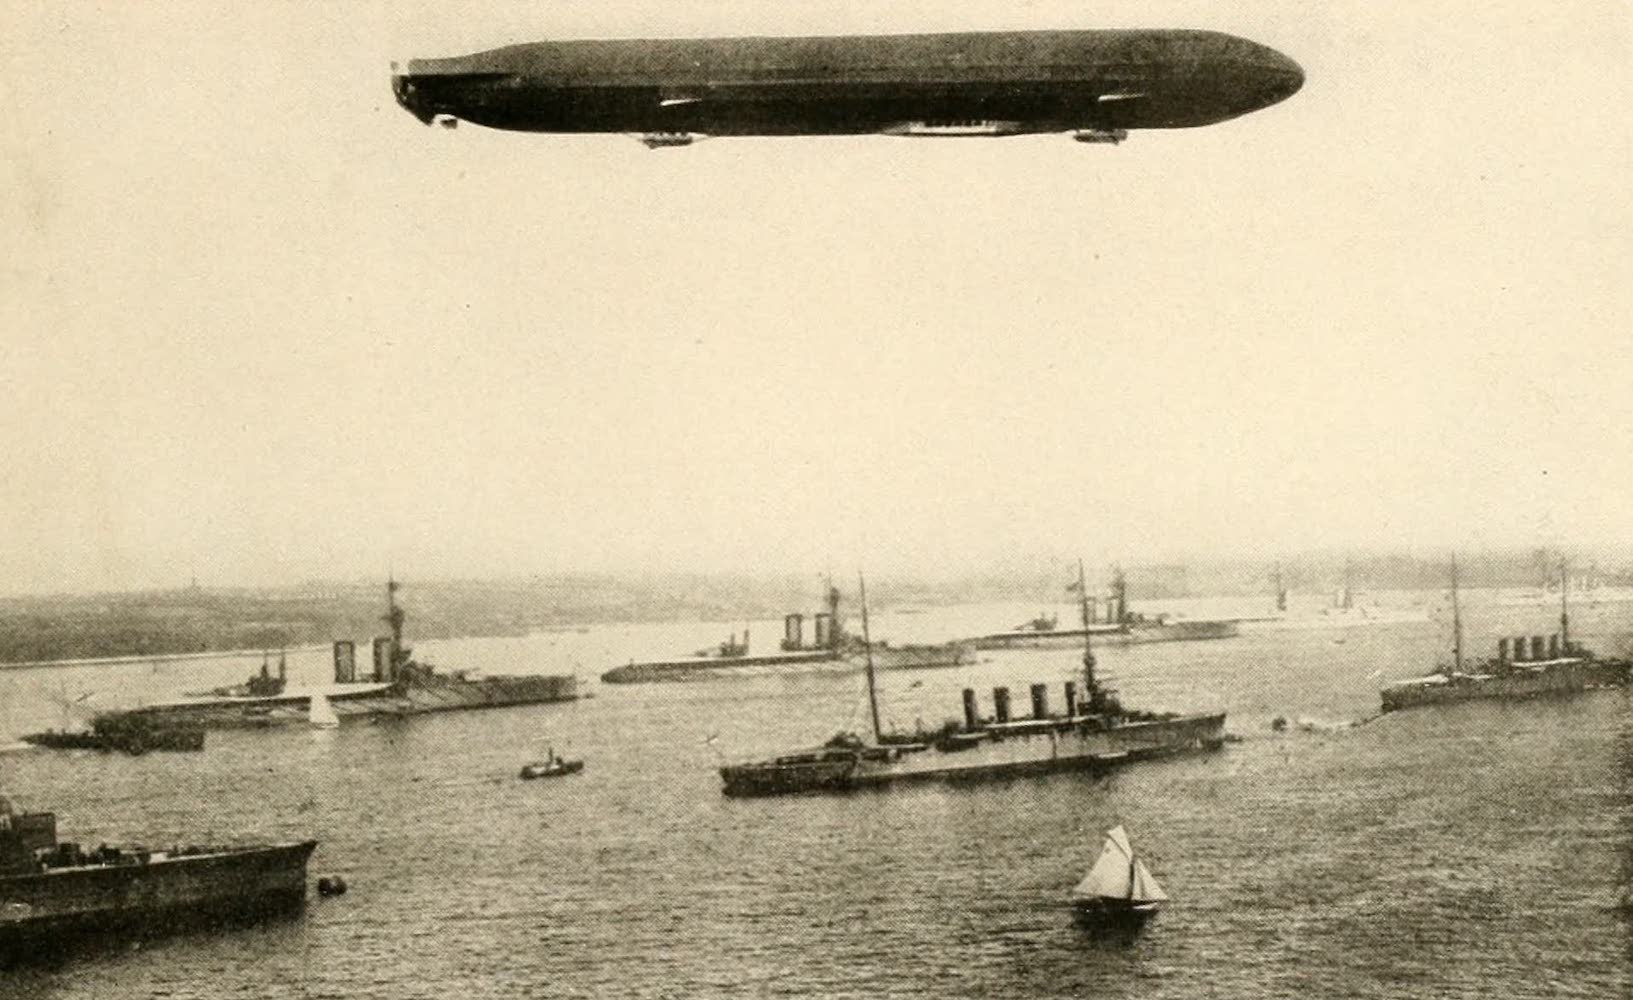 Laird & Lee's World's War Glimpses - German Dirigible Flying Over the British Fleet (1914)